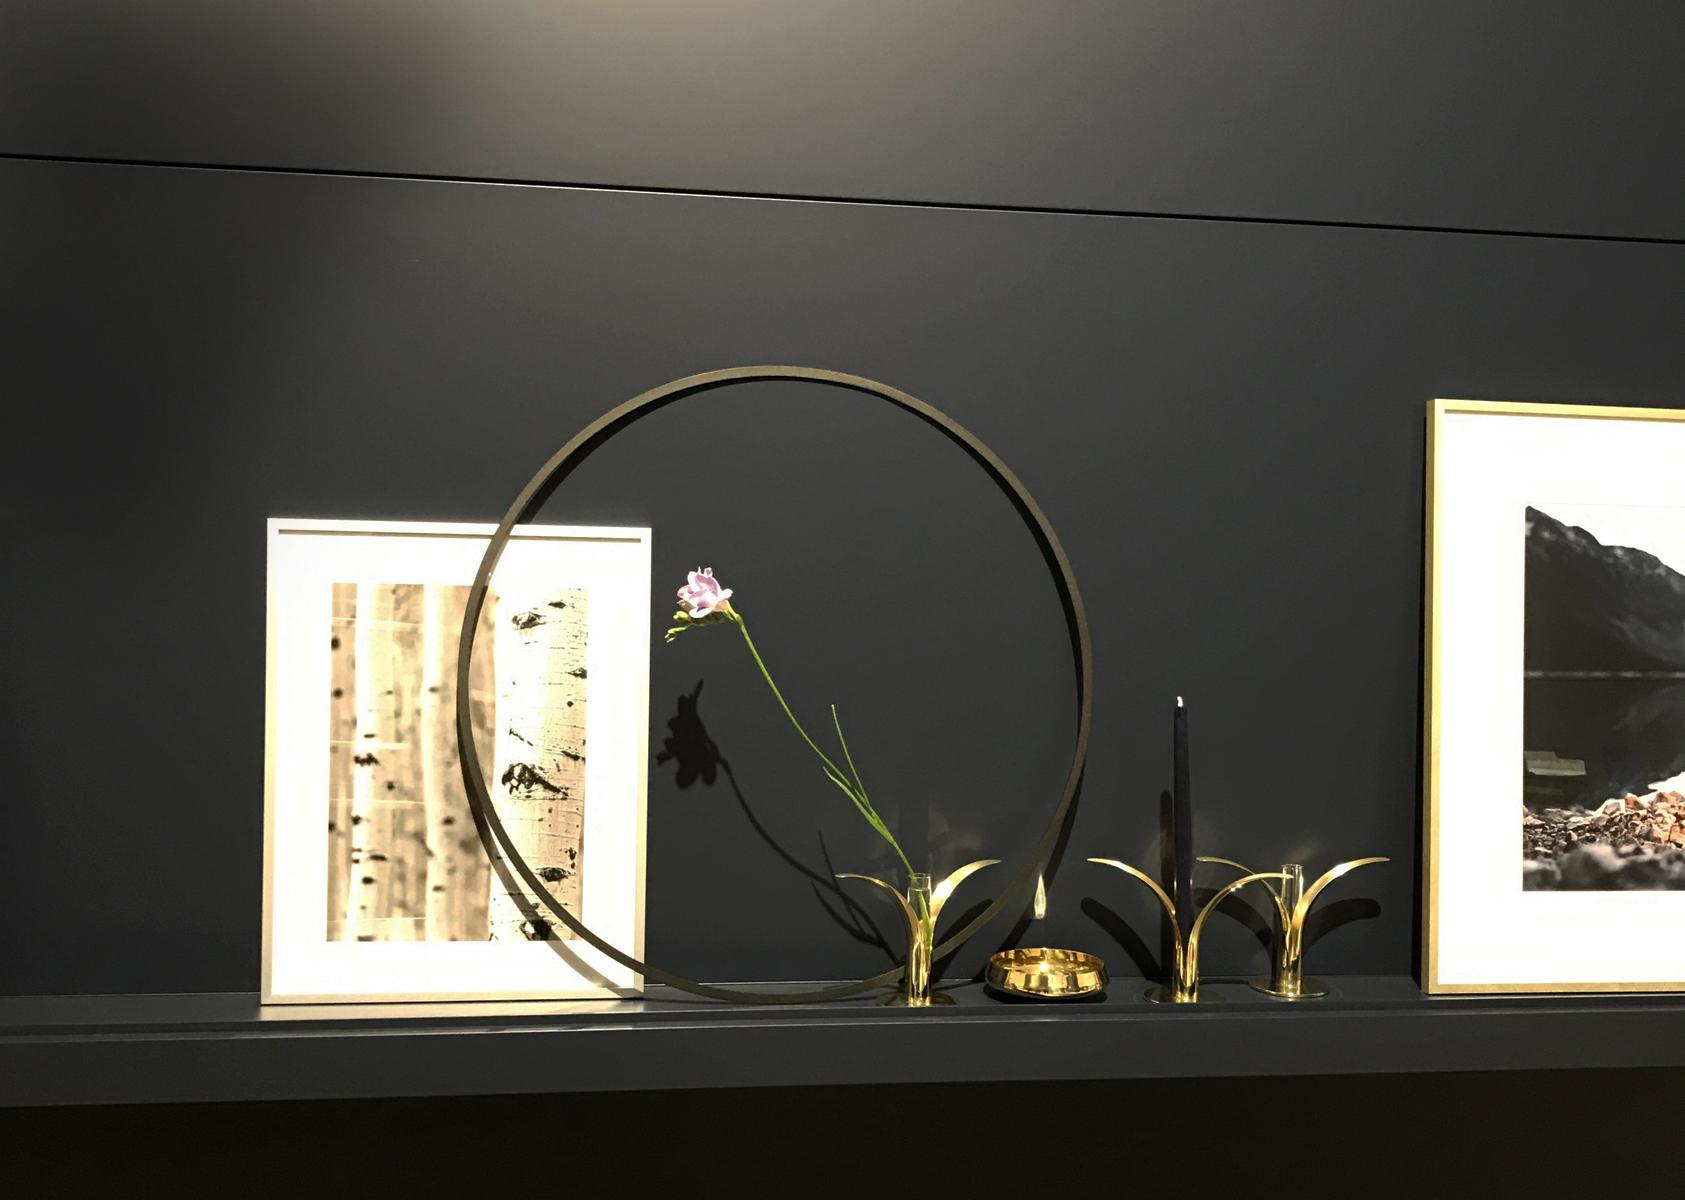 Electrolux-setdesign-nici-theuerkauf4.jpg